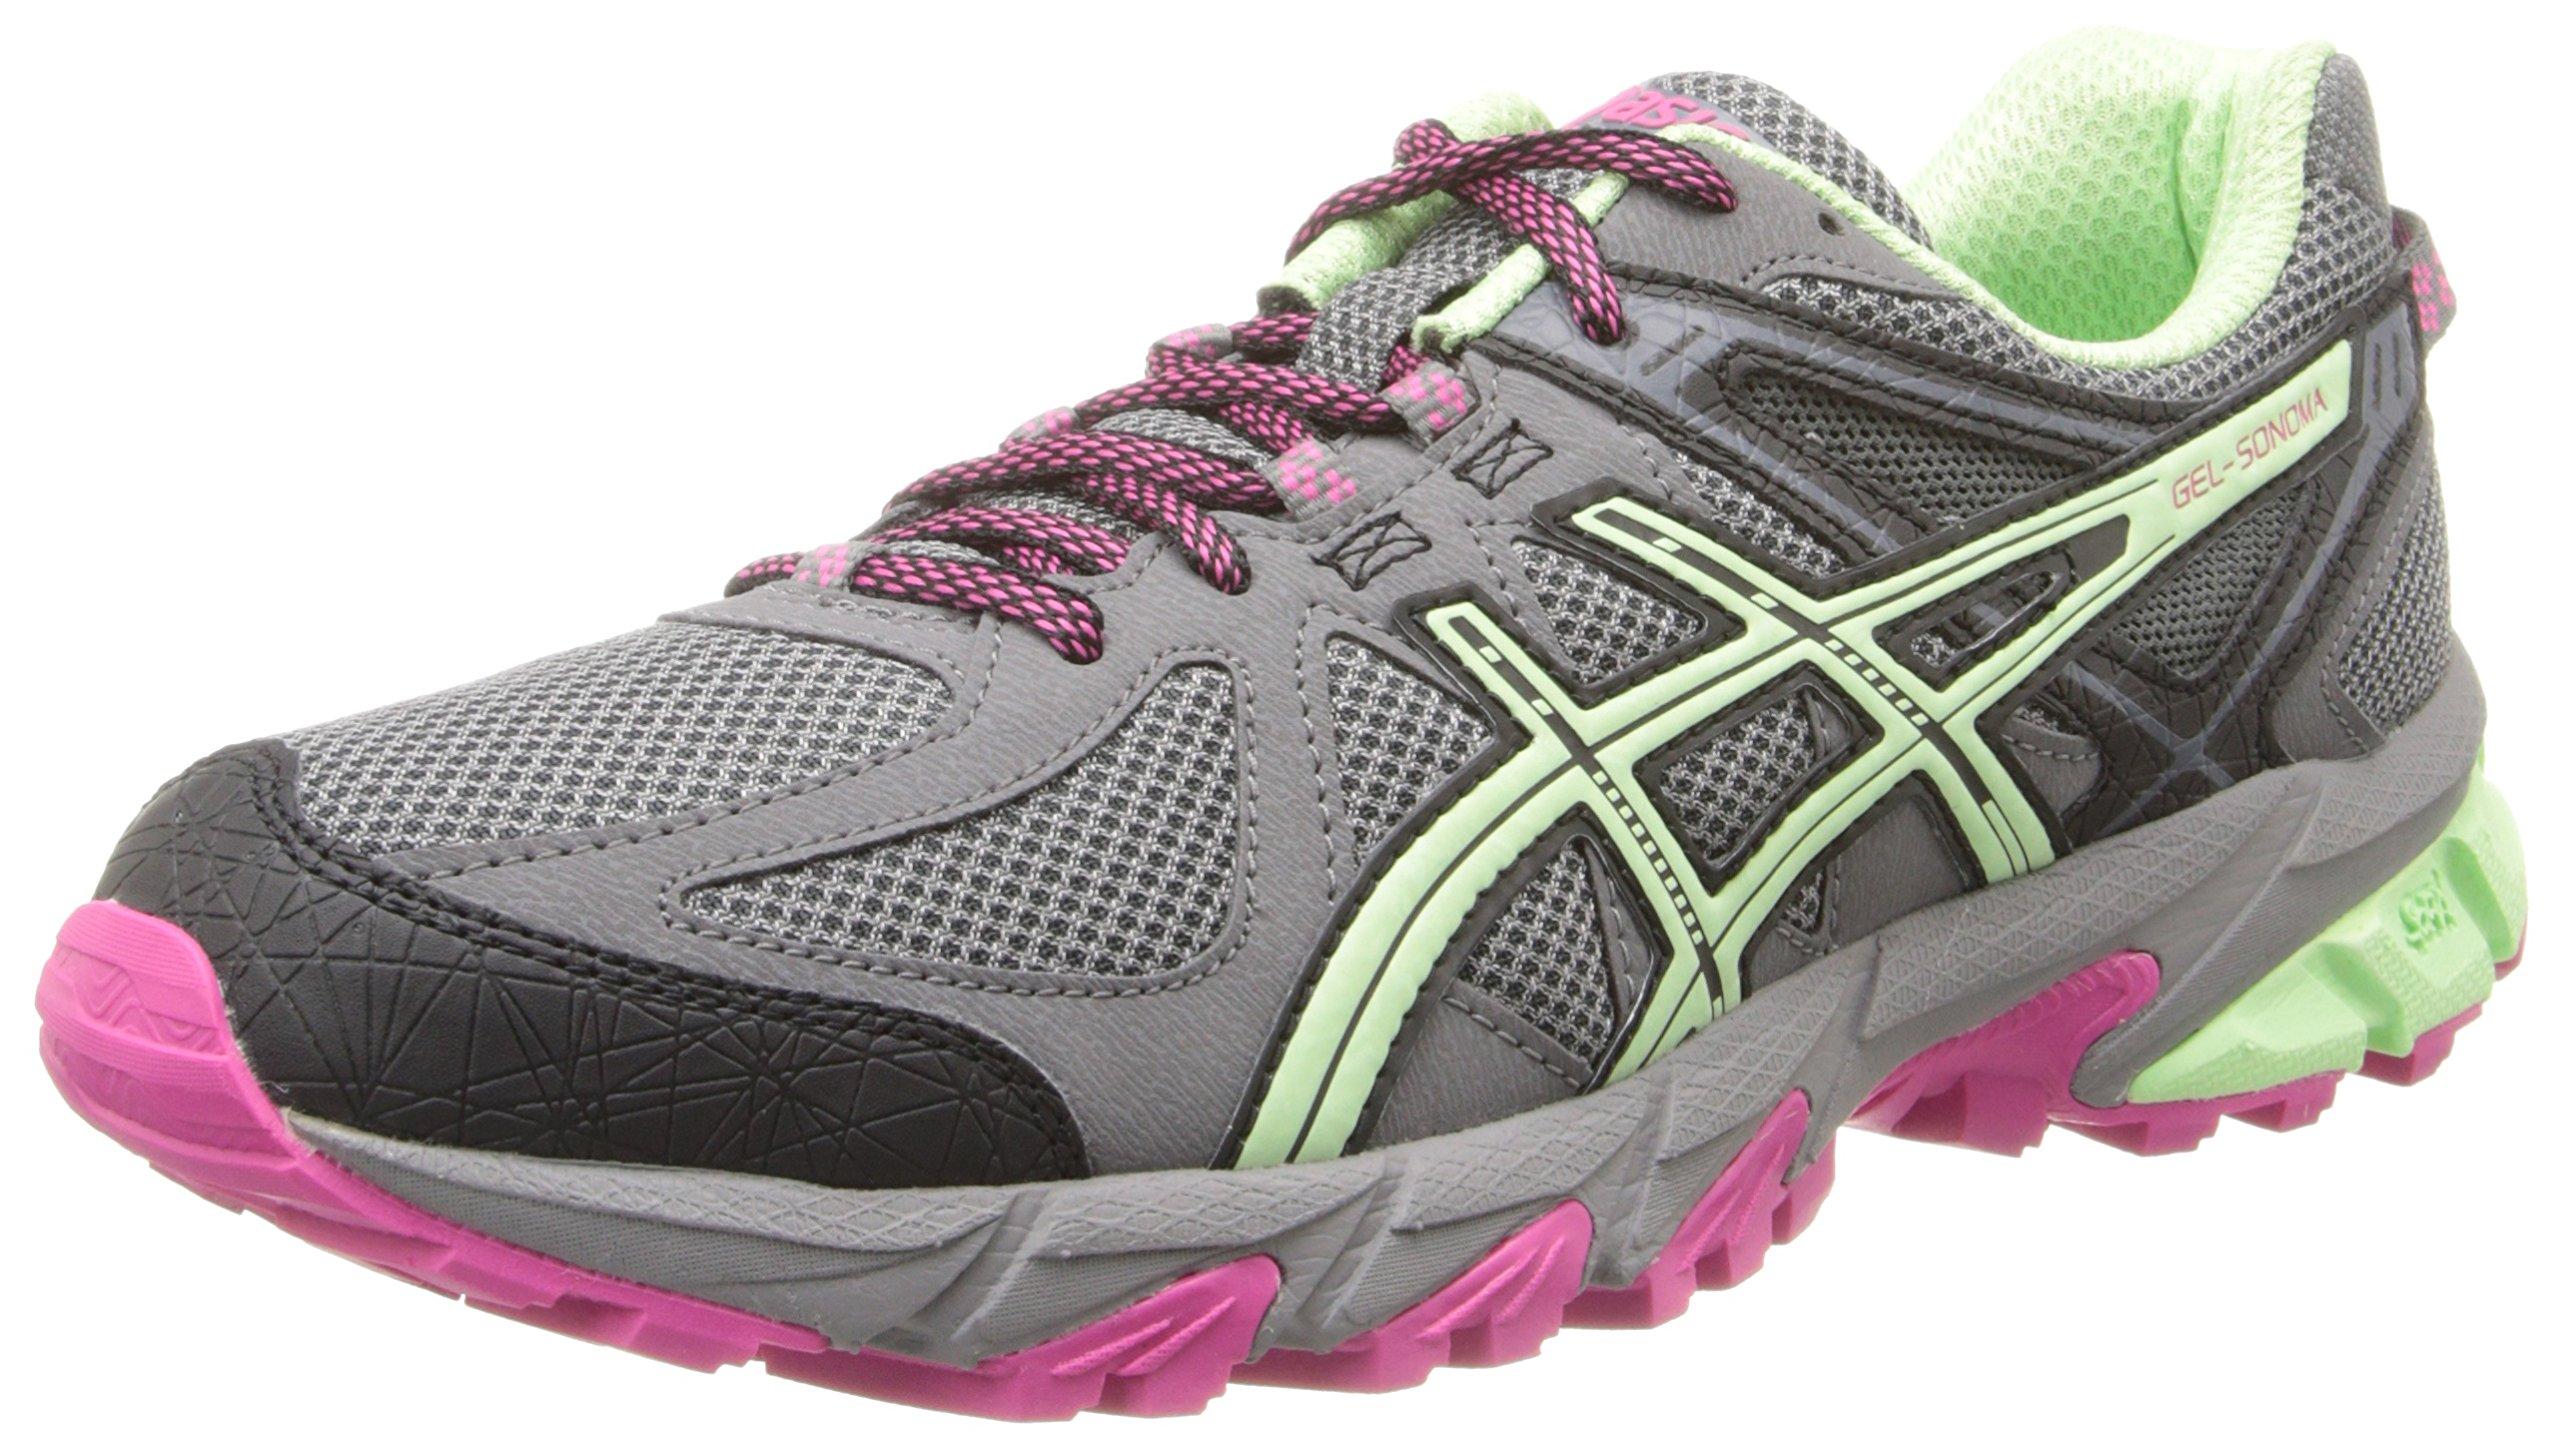 ASICS Women's Gel-Sonoma Running Shoe, Charcoal/Mint/Hot Pink, 9